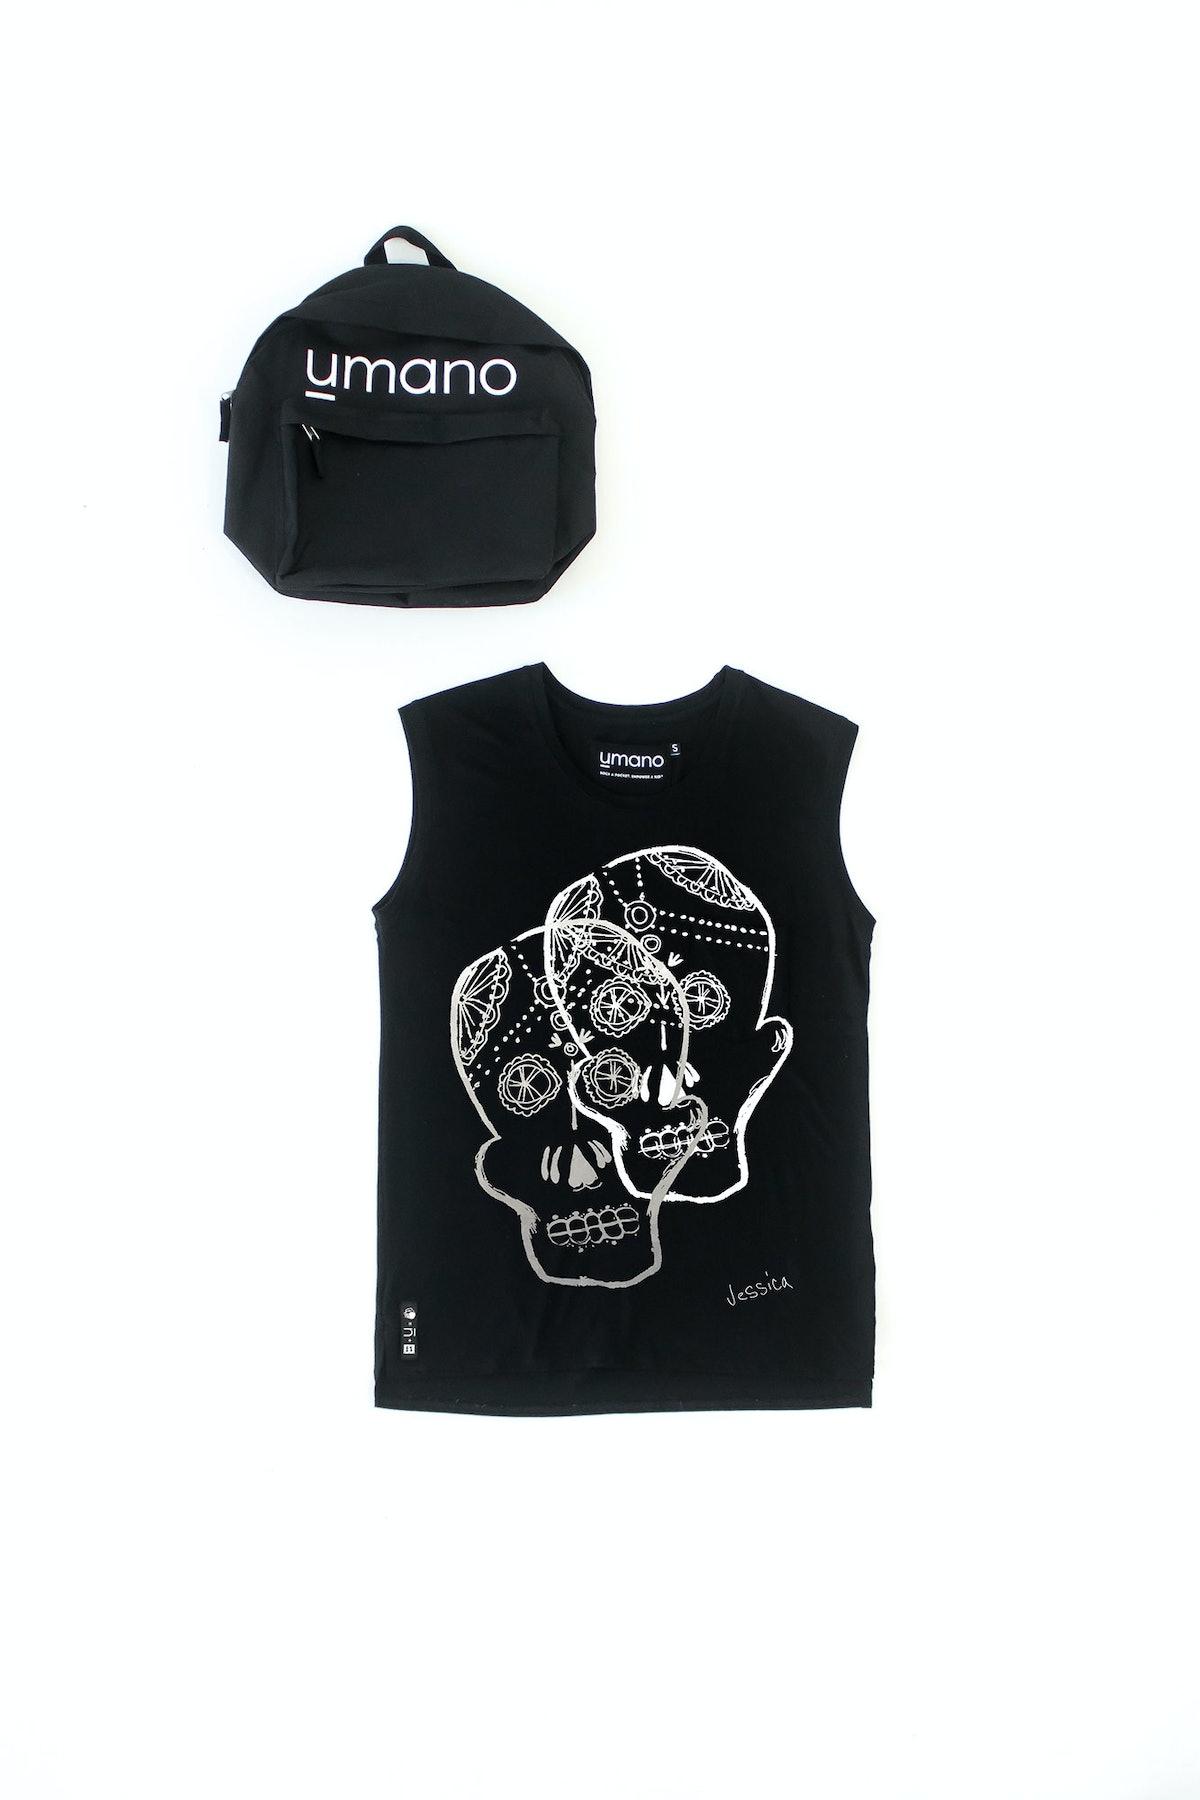 Umano The Skull muscle tee